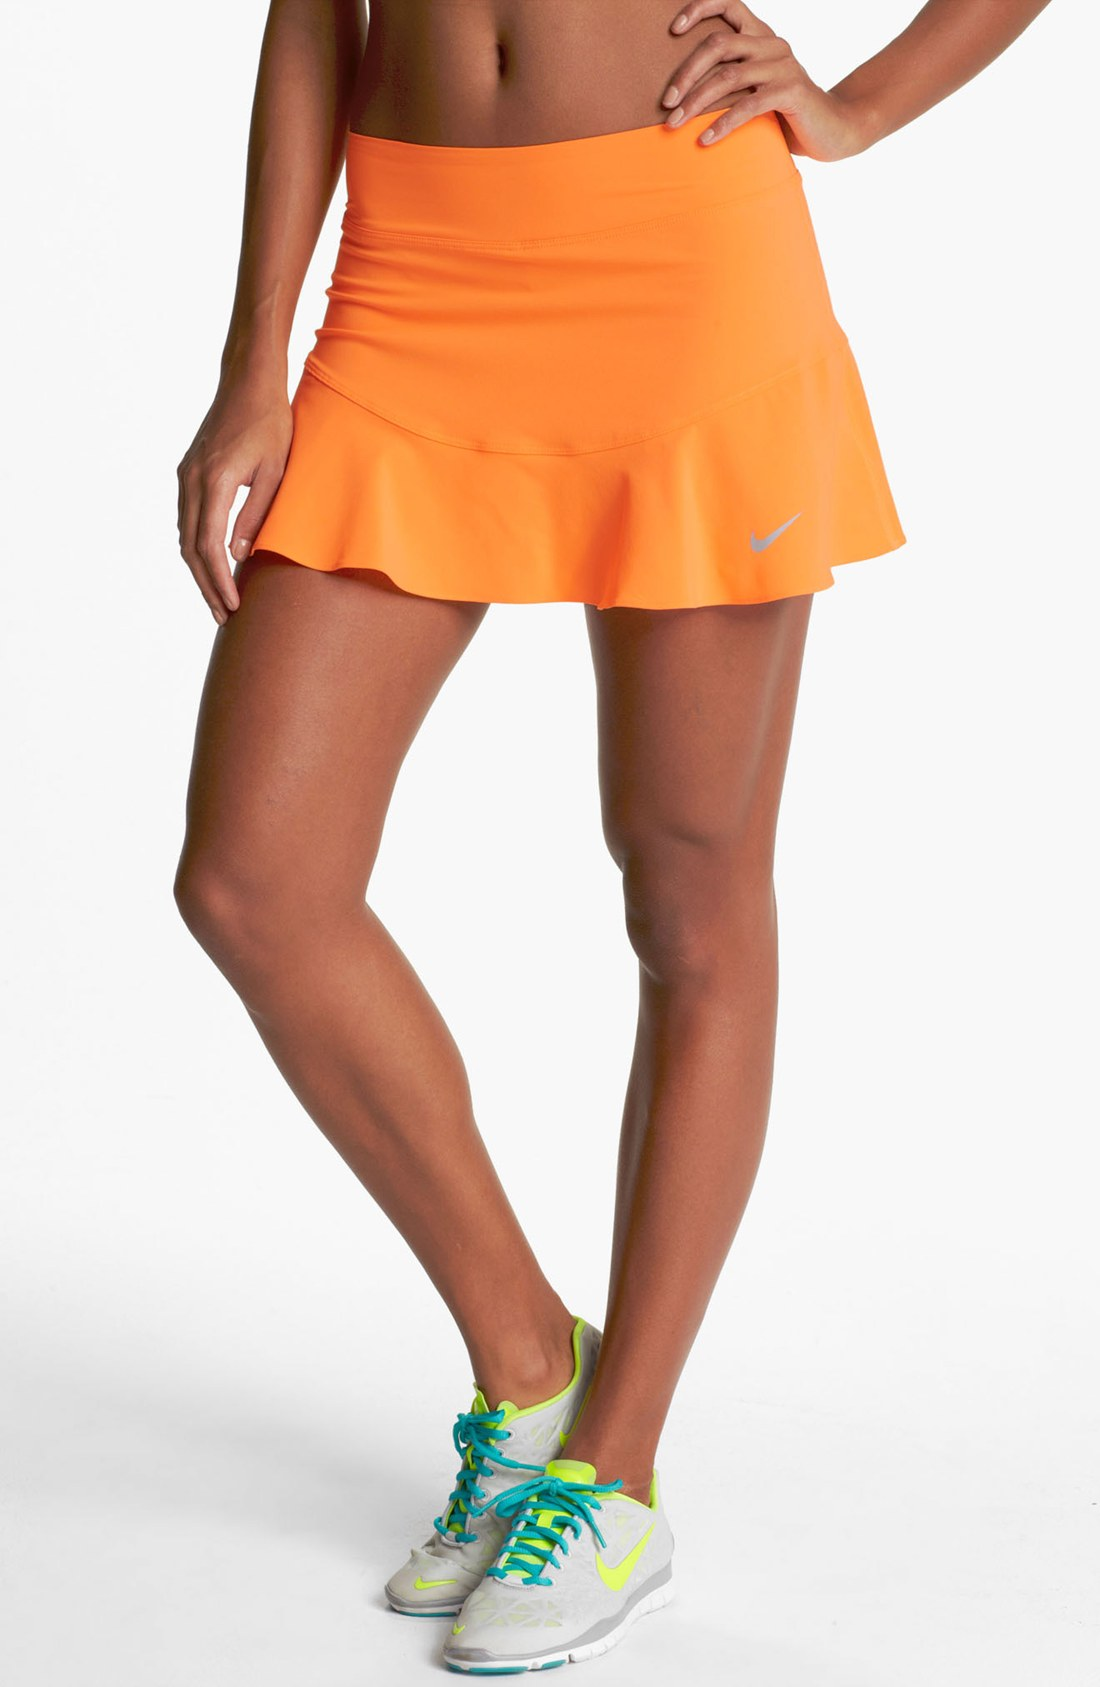 Orange Tennis Skirt 87